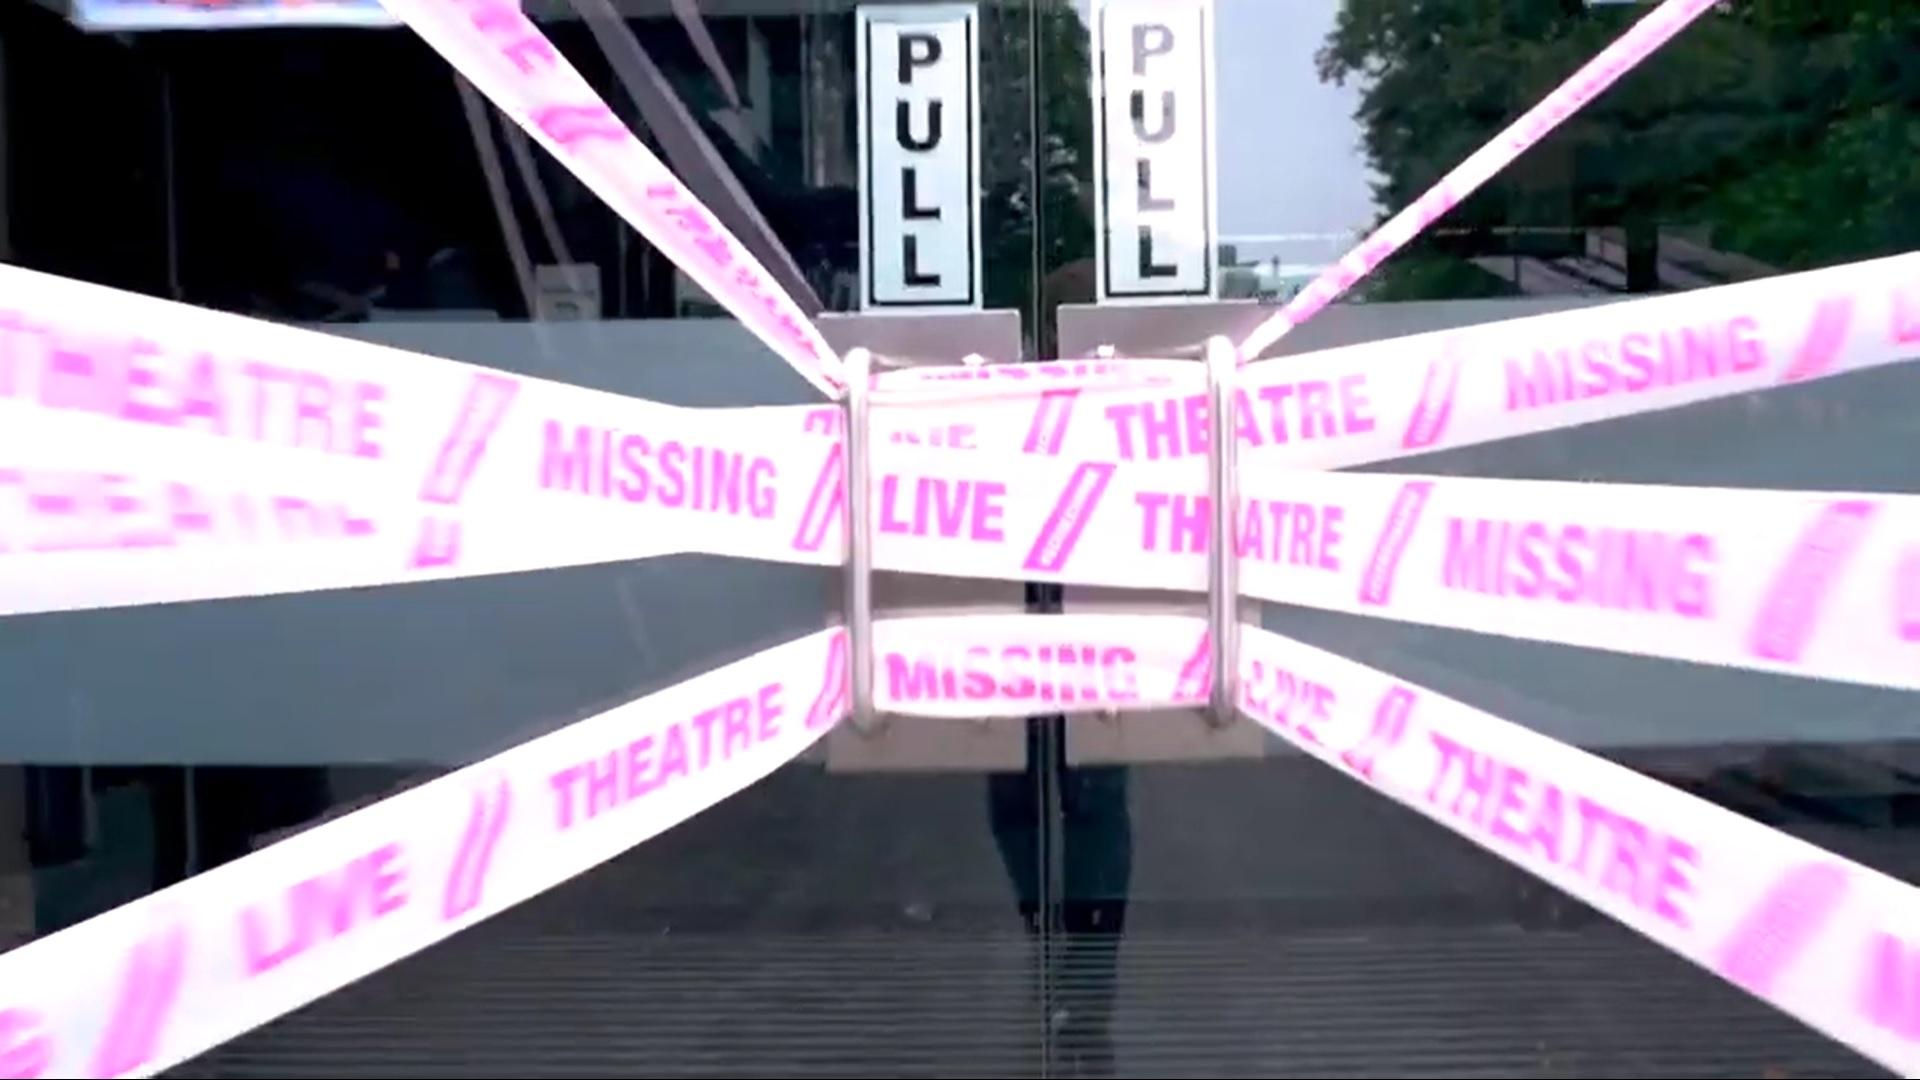 Scene Change - #MissingLiveTheatre